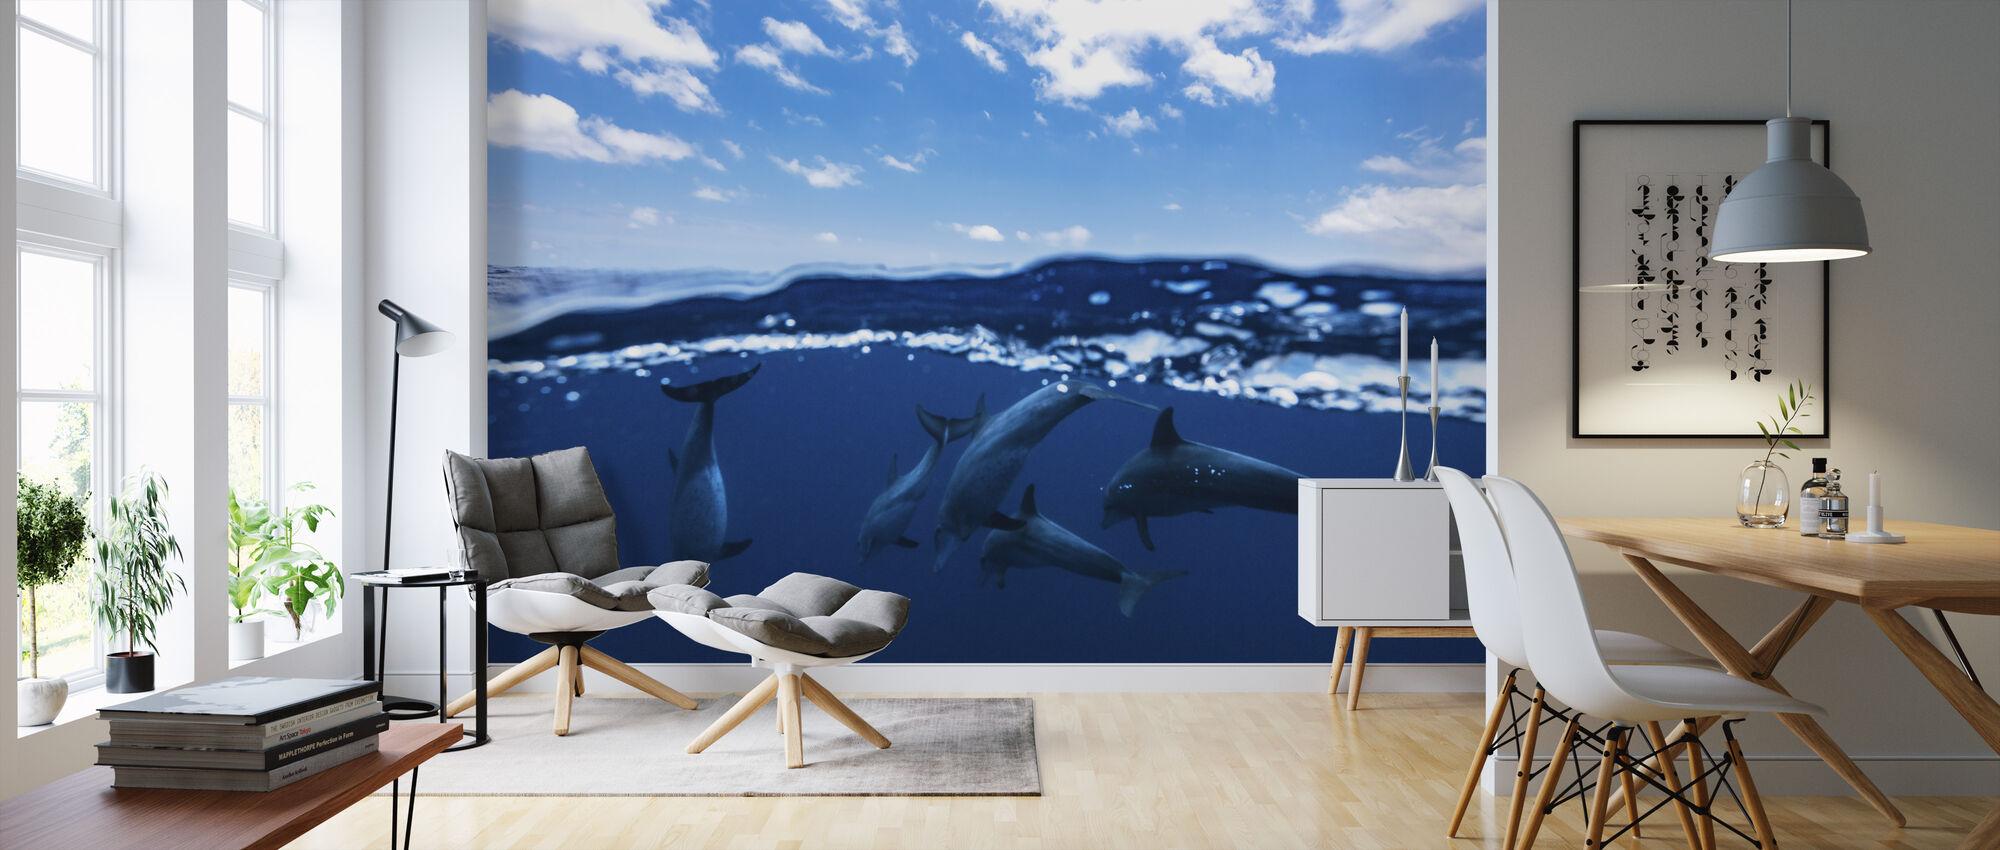 Between Air and Water - Wallpaper - Living Room